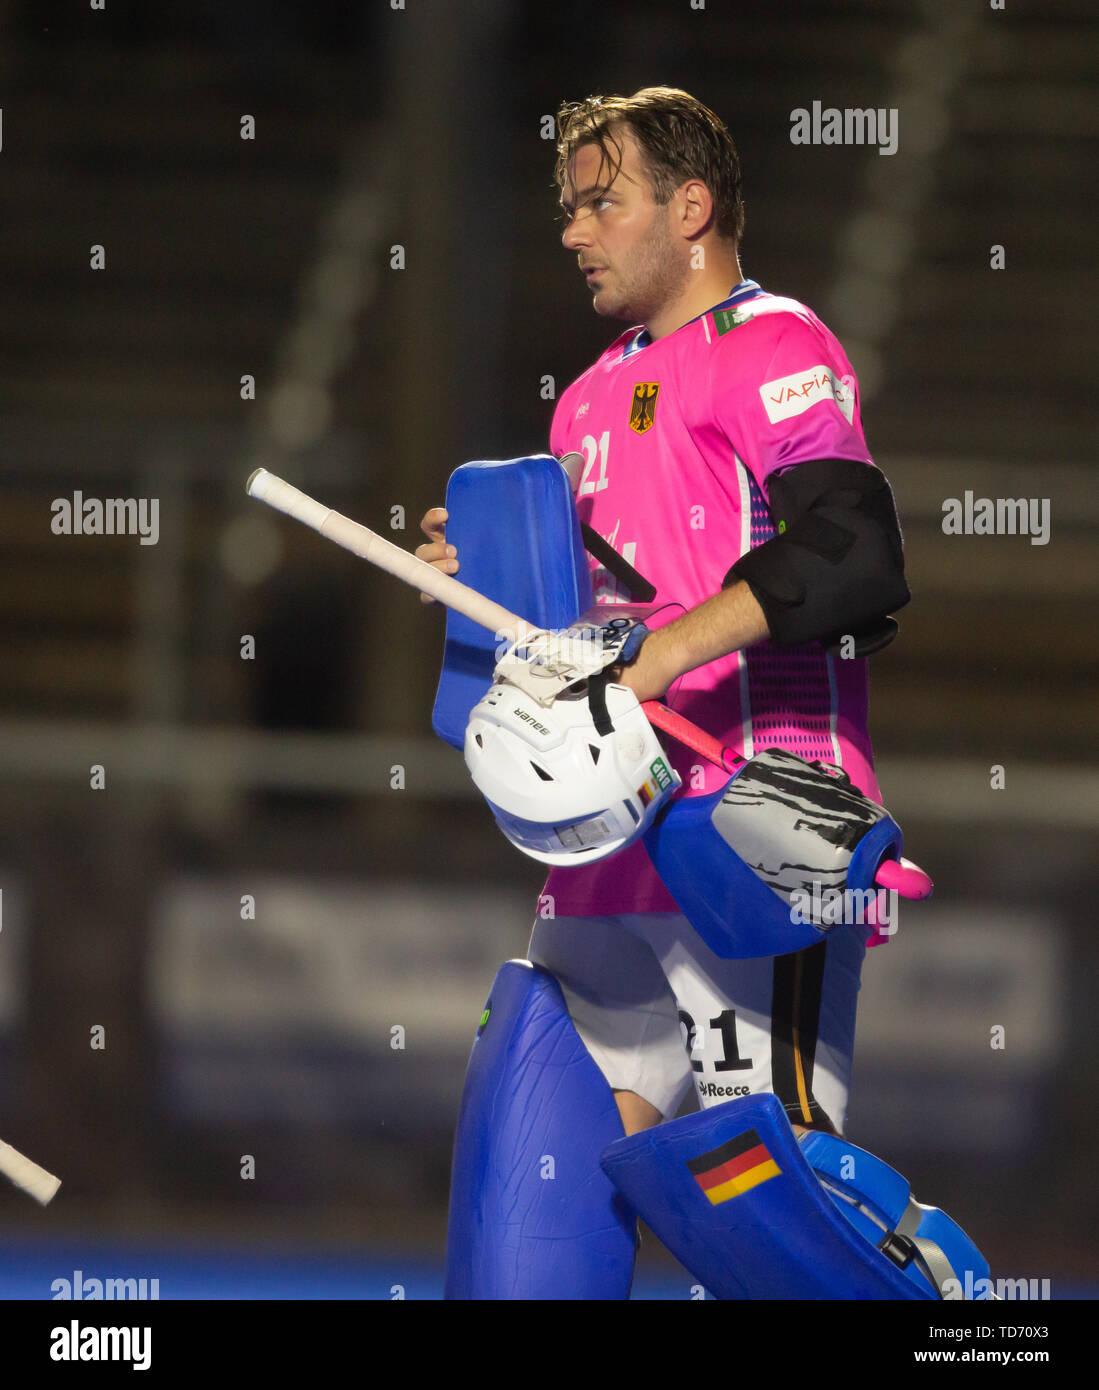 Krefeld, Germany, 12.06.2019, Hockey, FIH Pro League, men, Germany vs. Belgium: Tobias Walter (Germany) looks on. - Stock Image